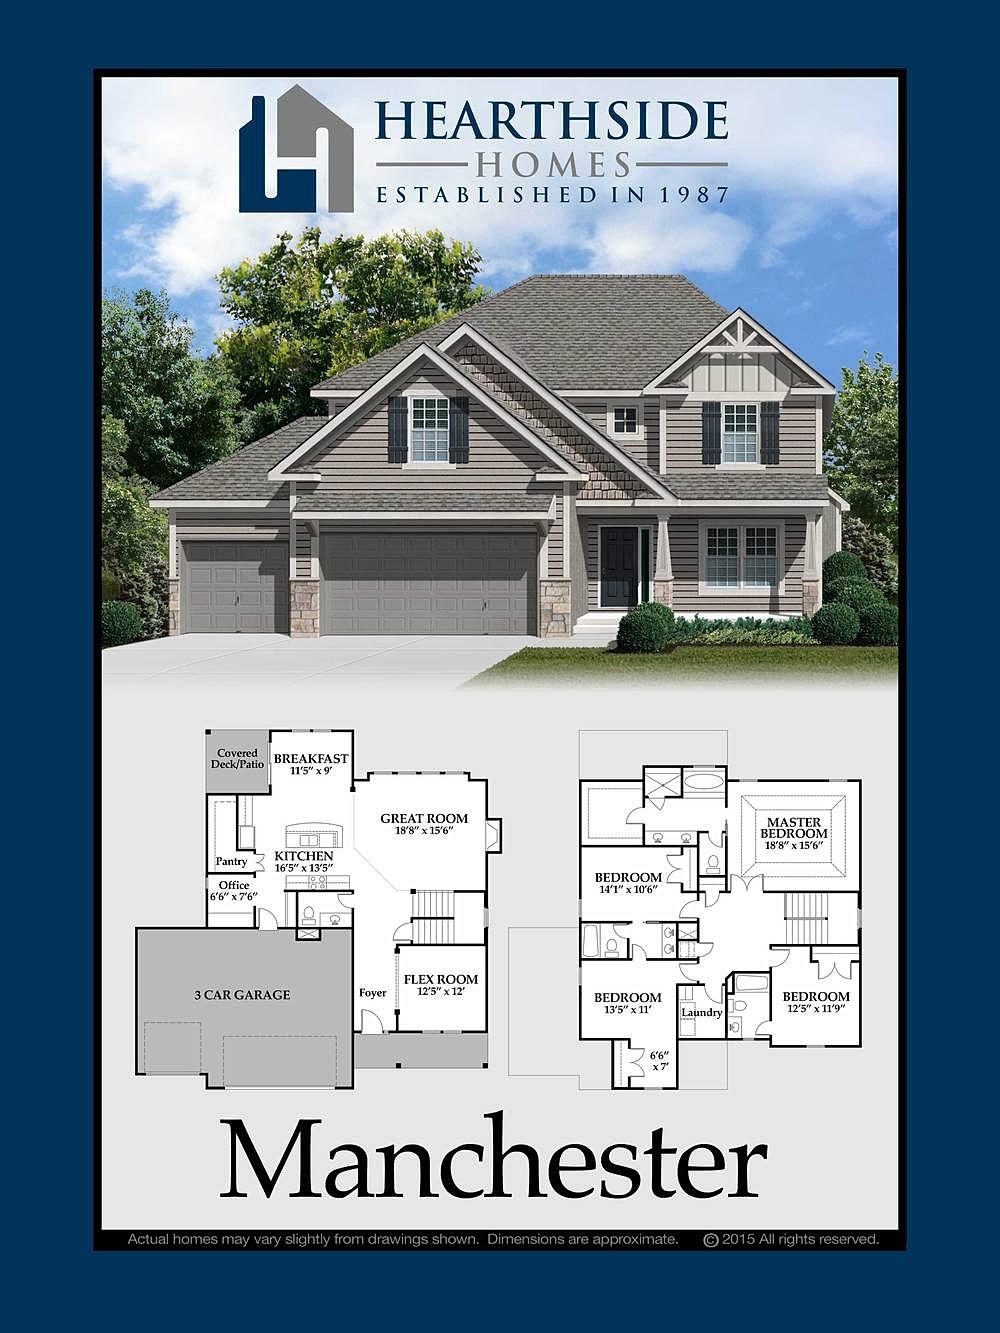 Hearthside homes manchester home plan Home plan com